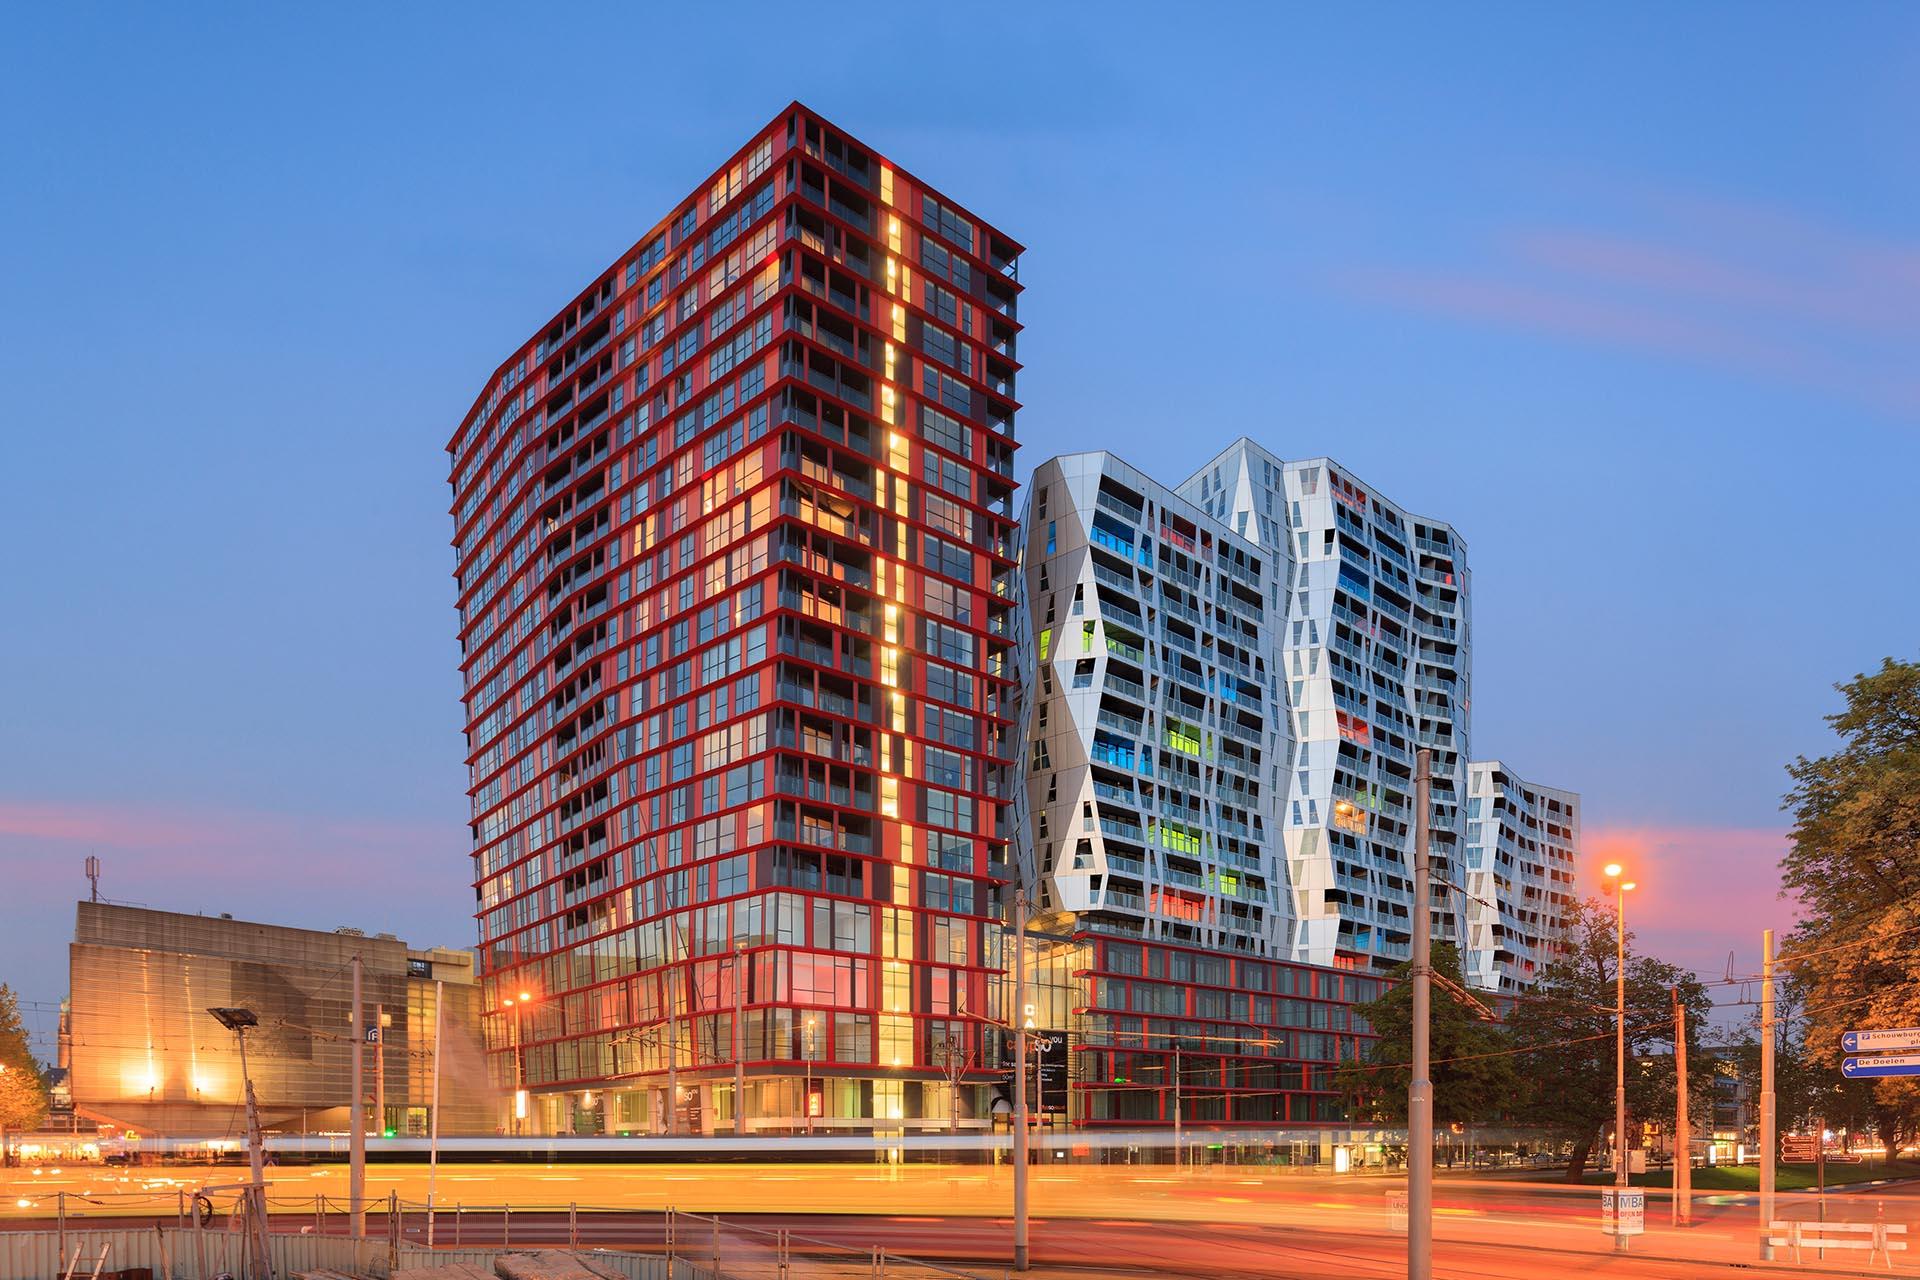 Fotograaf architectuur in Rotterdam